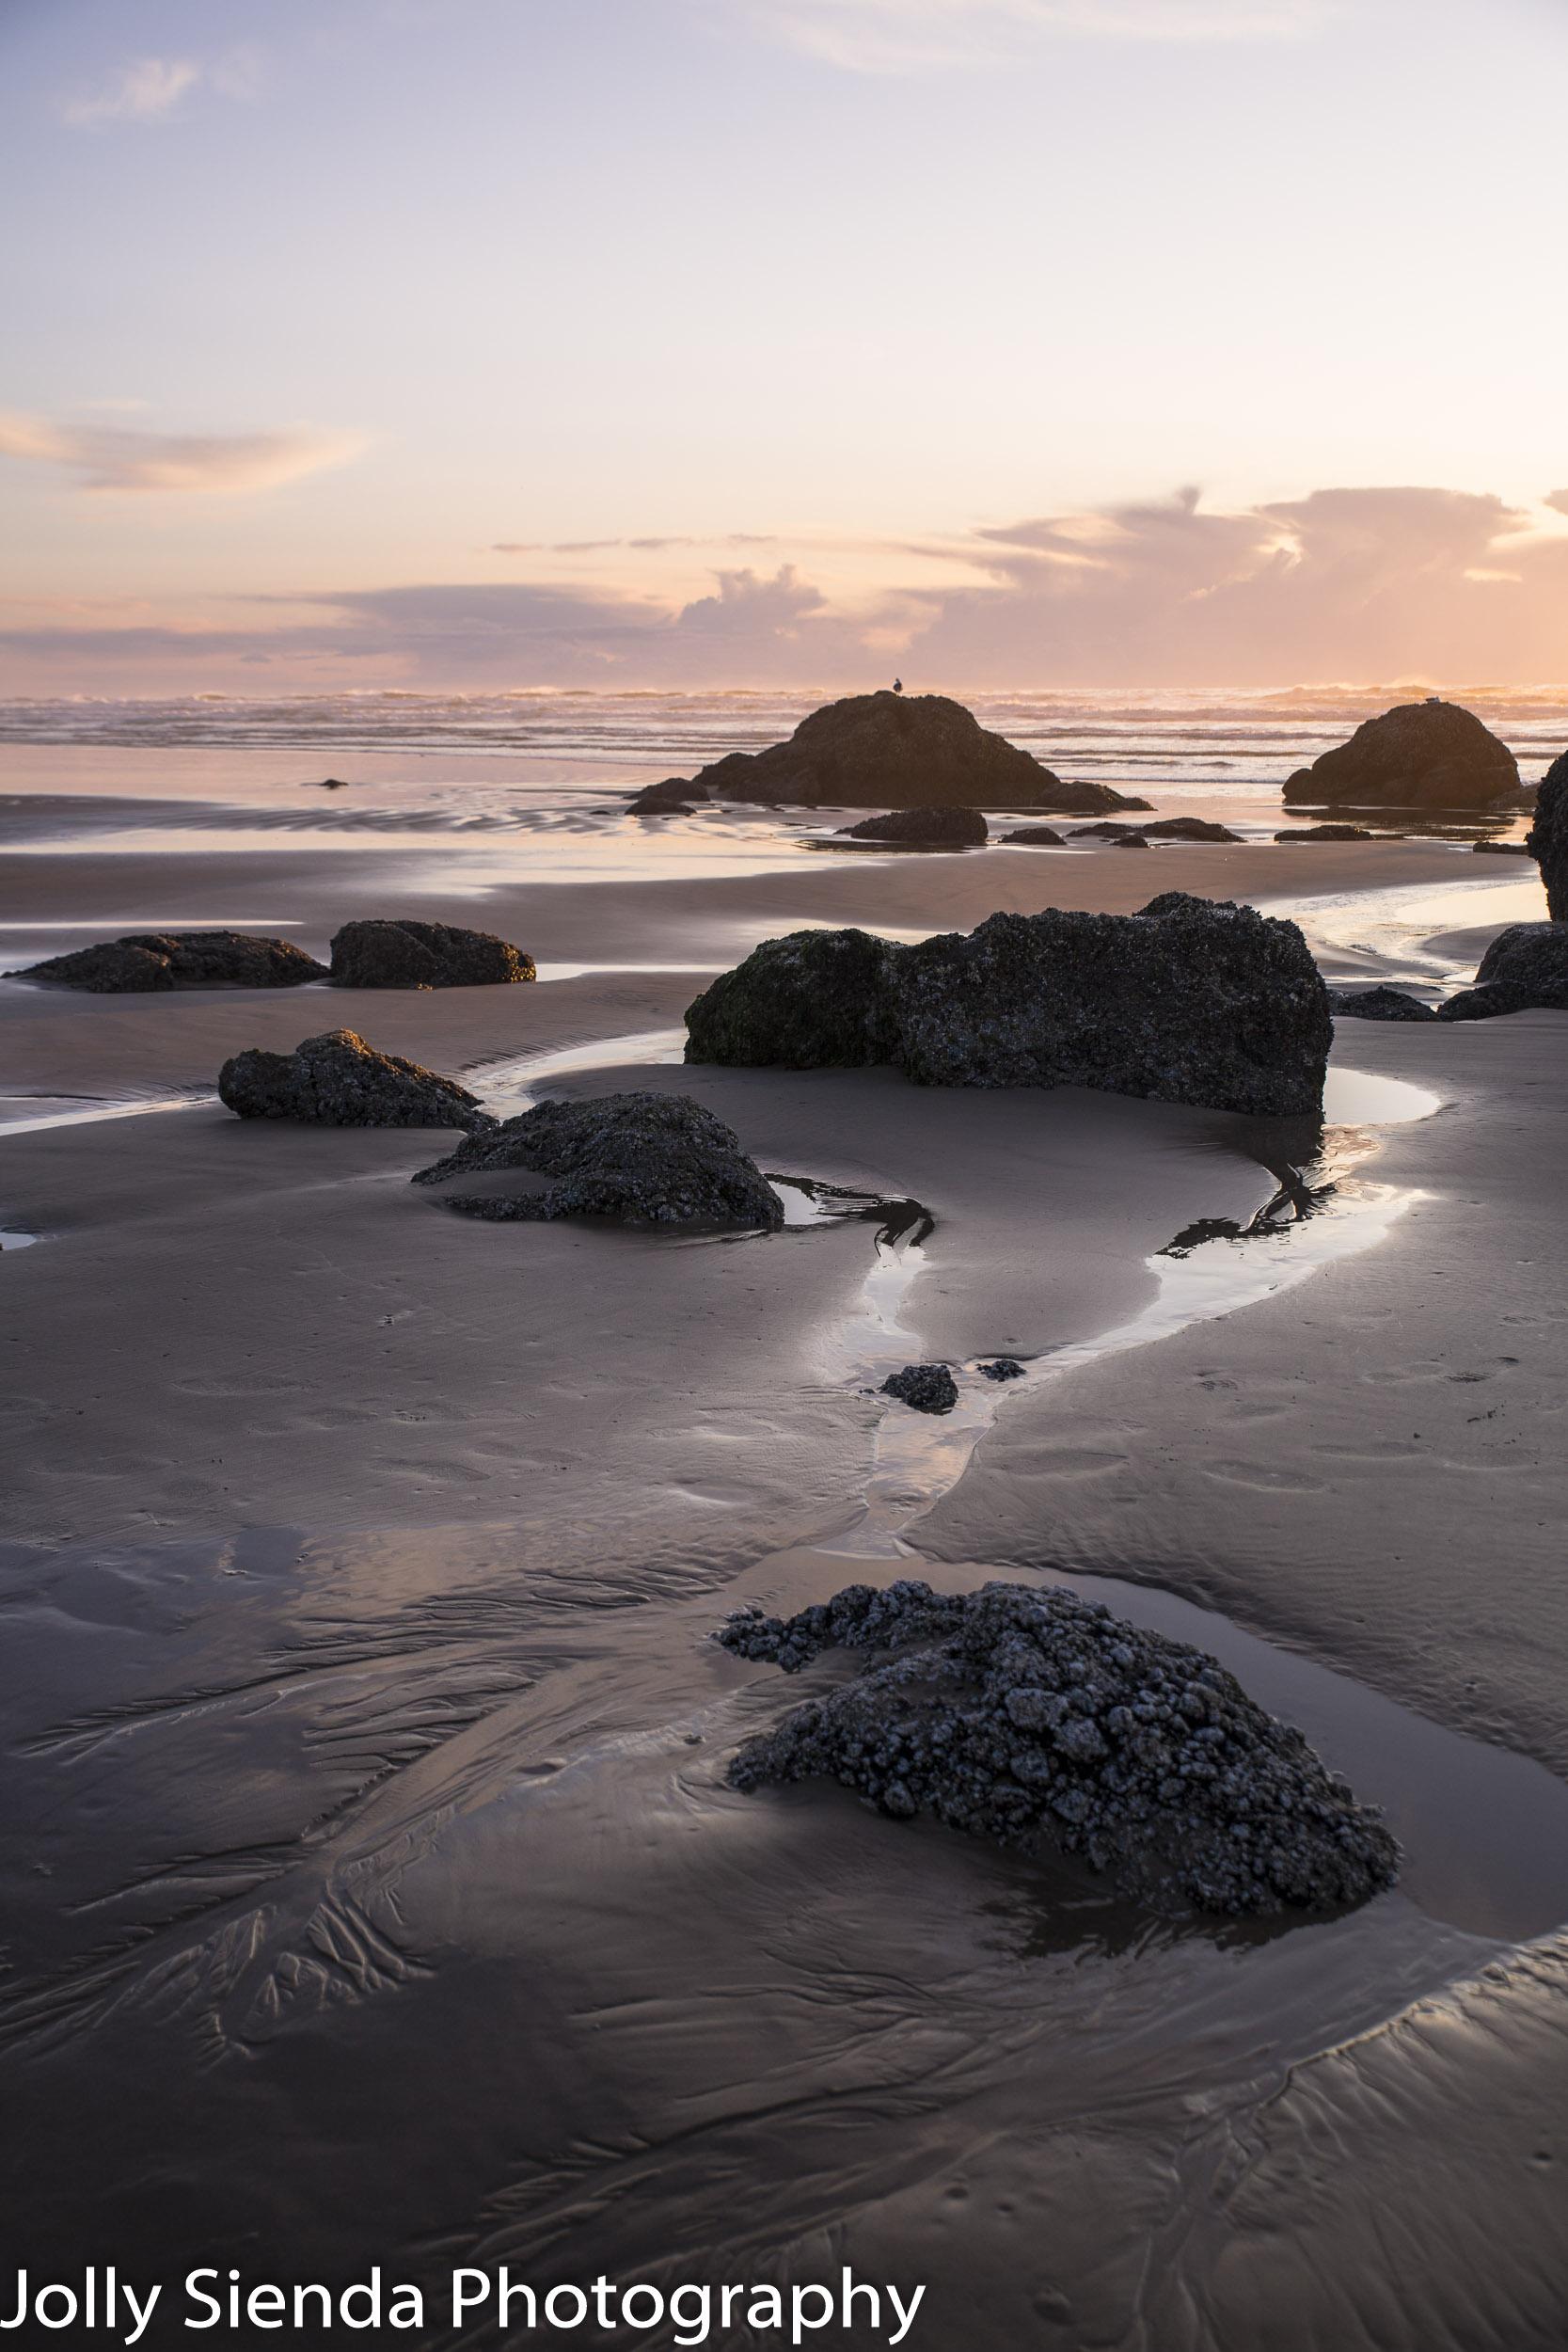 Wet haystack rocks make a zig zag pattern with tide pools, wet s